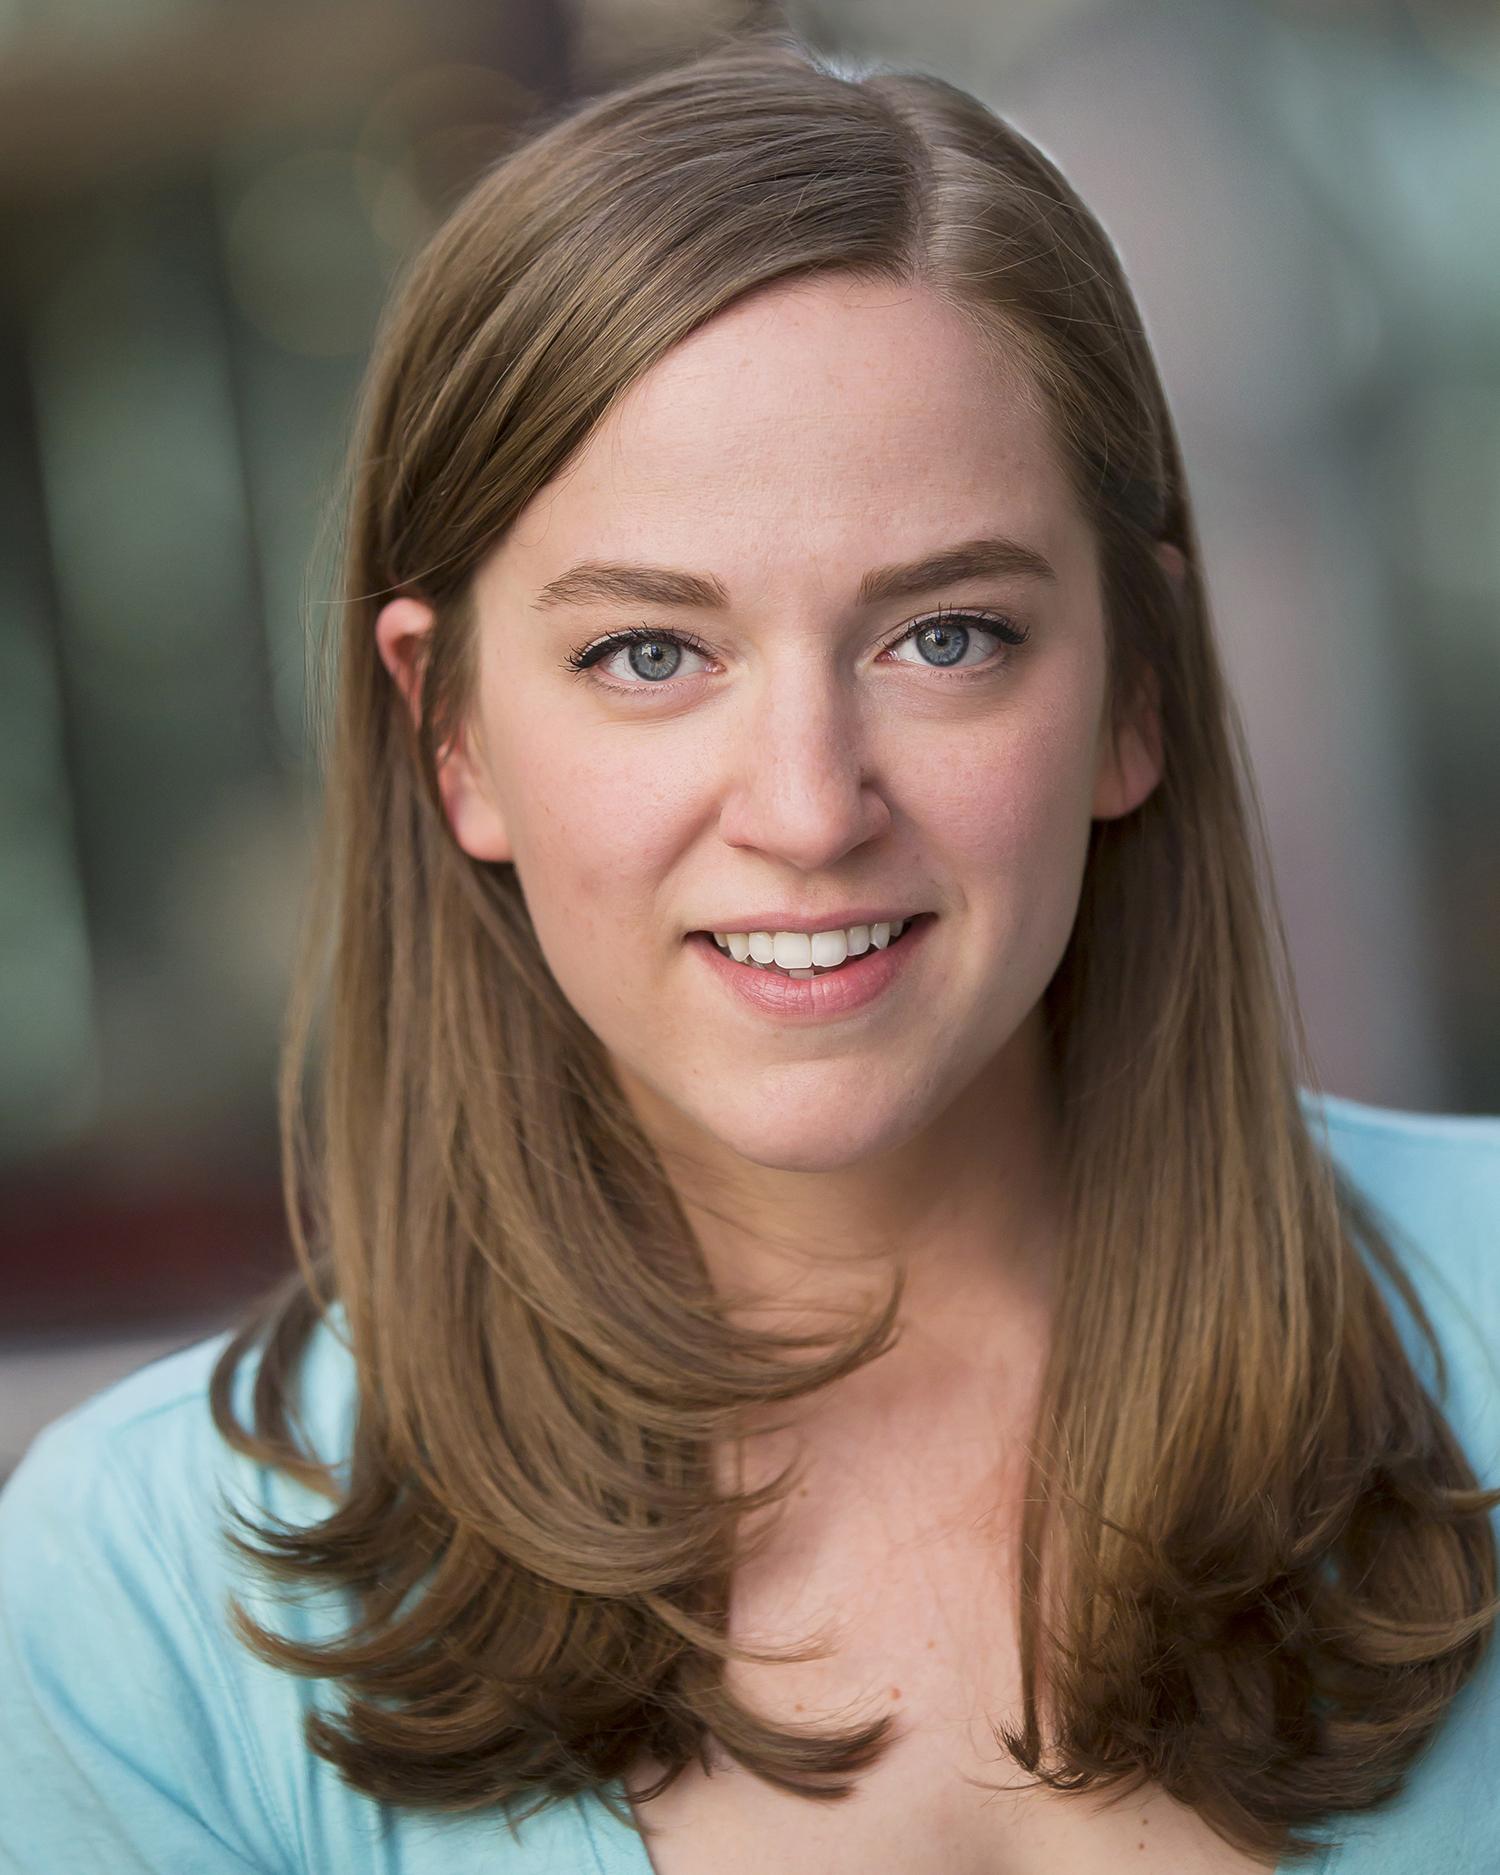 Ingenue Young Woman Actor Headshots in Denver with photographer Jennifer Koskinen | Merritt Portrait Studio